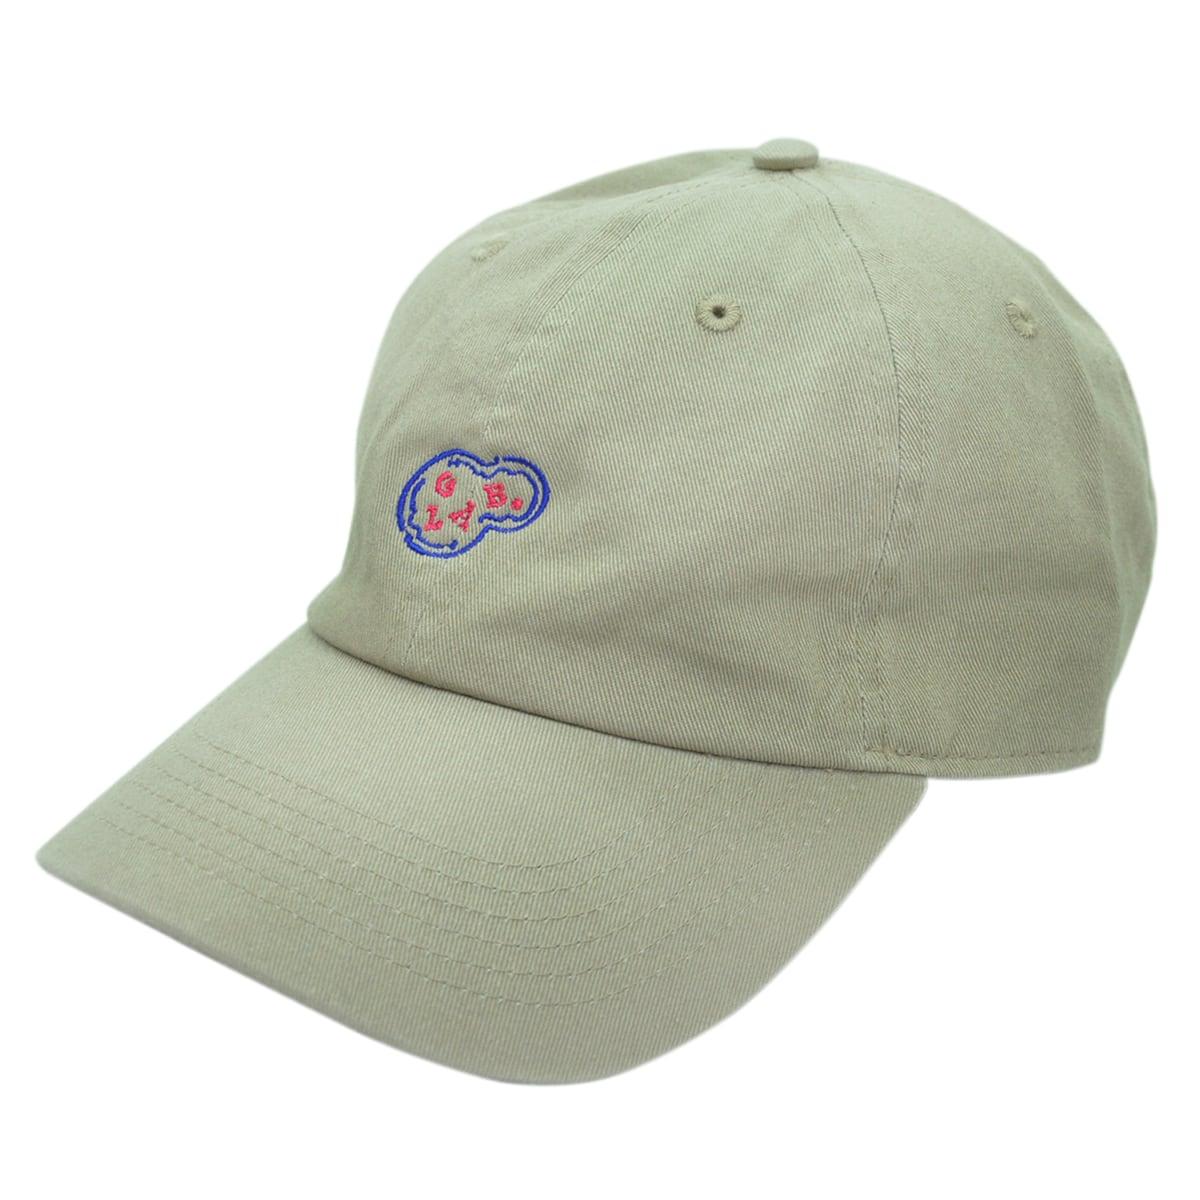 Beseball Low Cap / Khaki